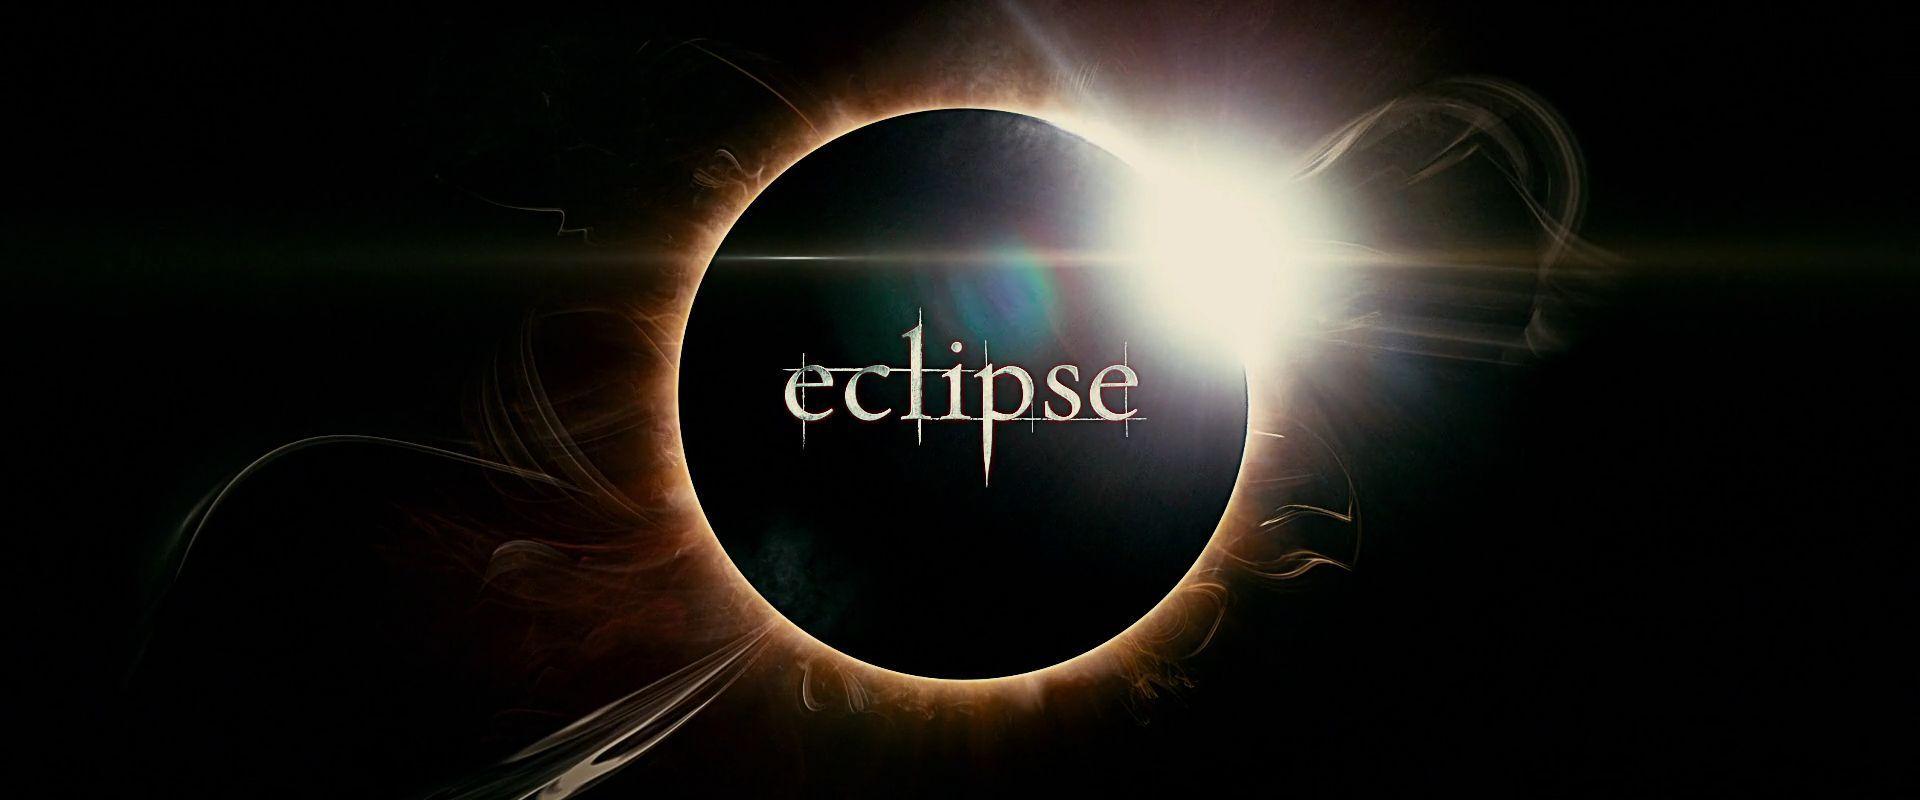 Eclipse Movie images E...